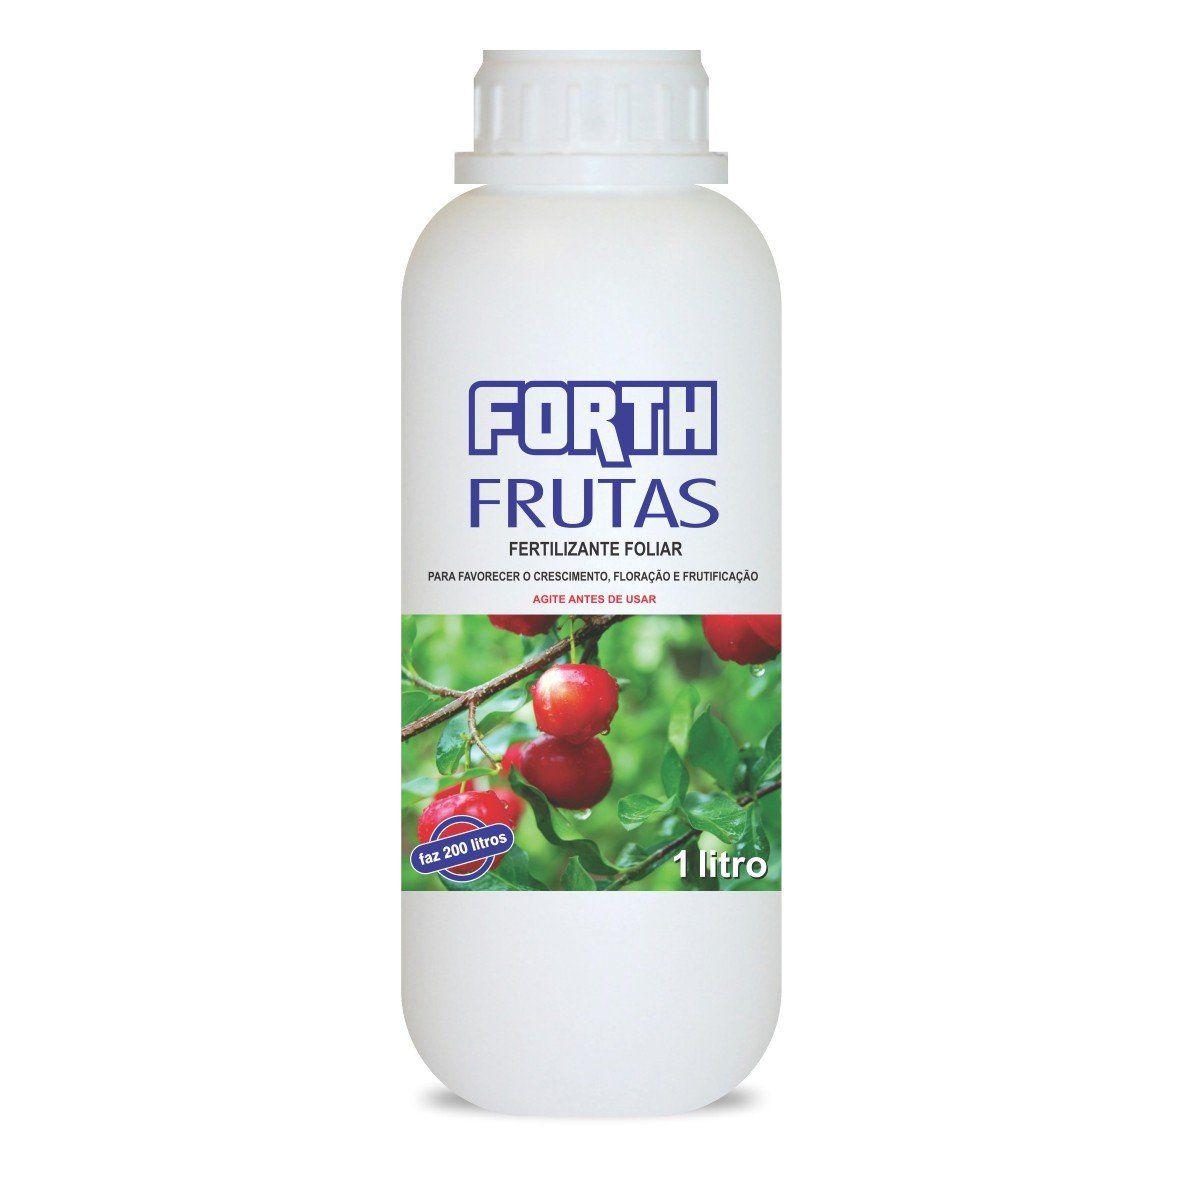 Adubo Fertilizante para Frutas - FORTH Frutas - 1Litro Faz 200 Litros